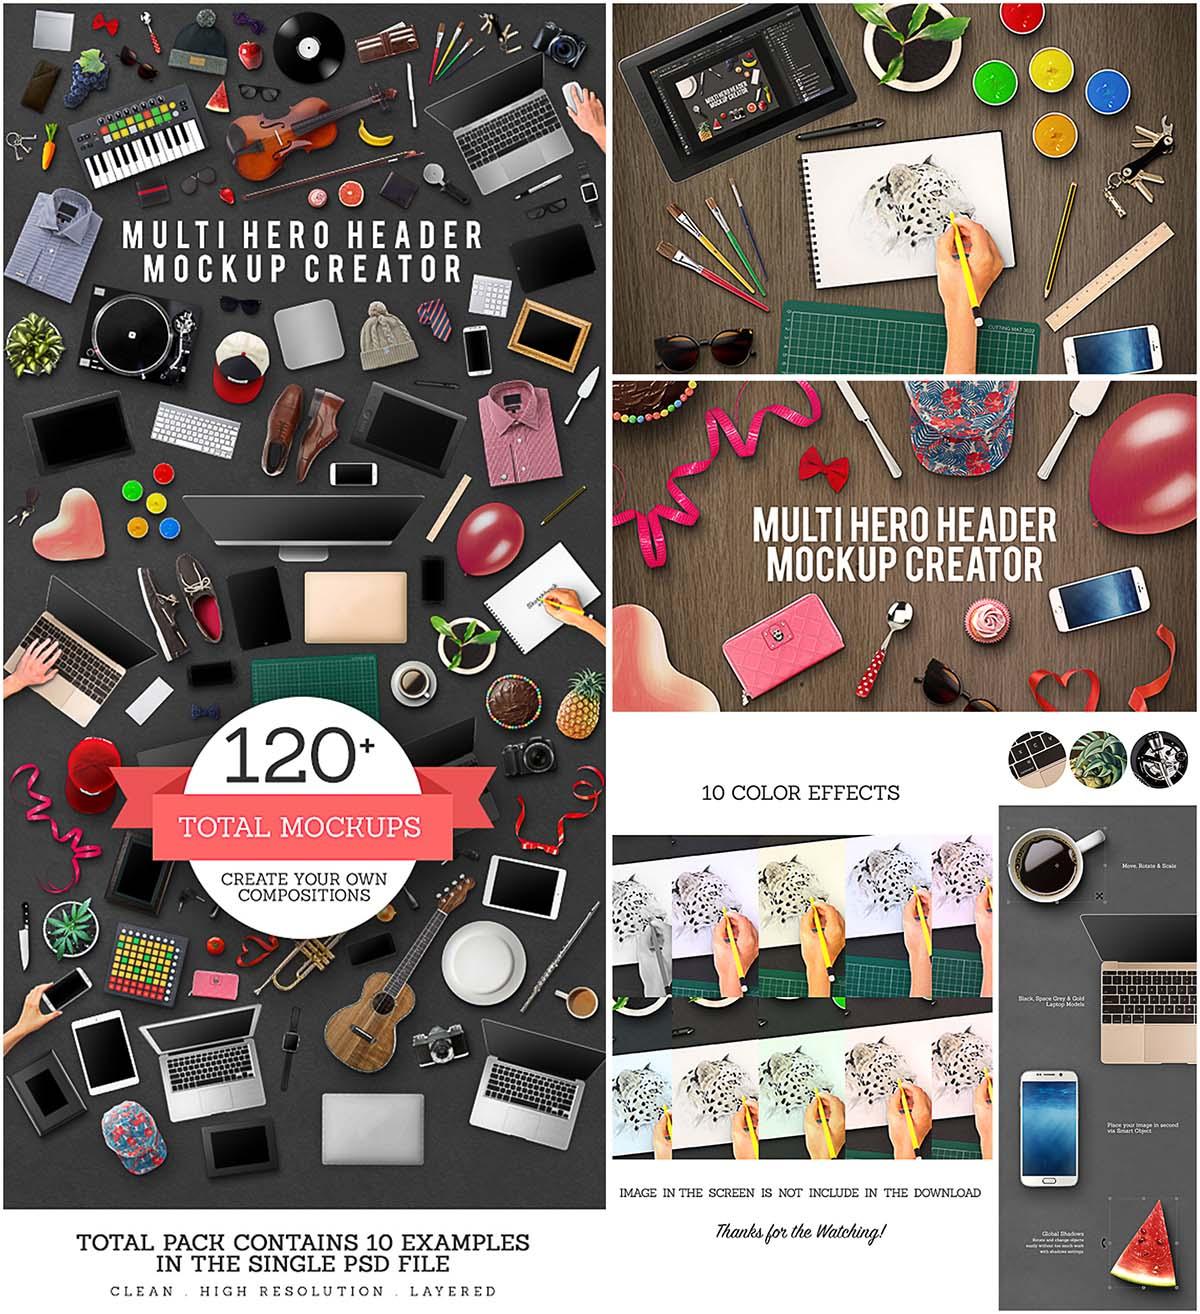 Multi hero Mock-up creation kit